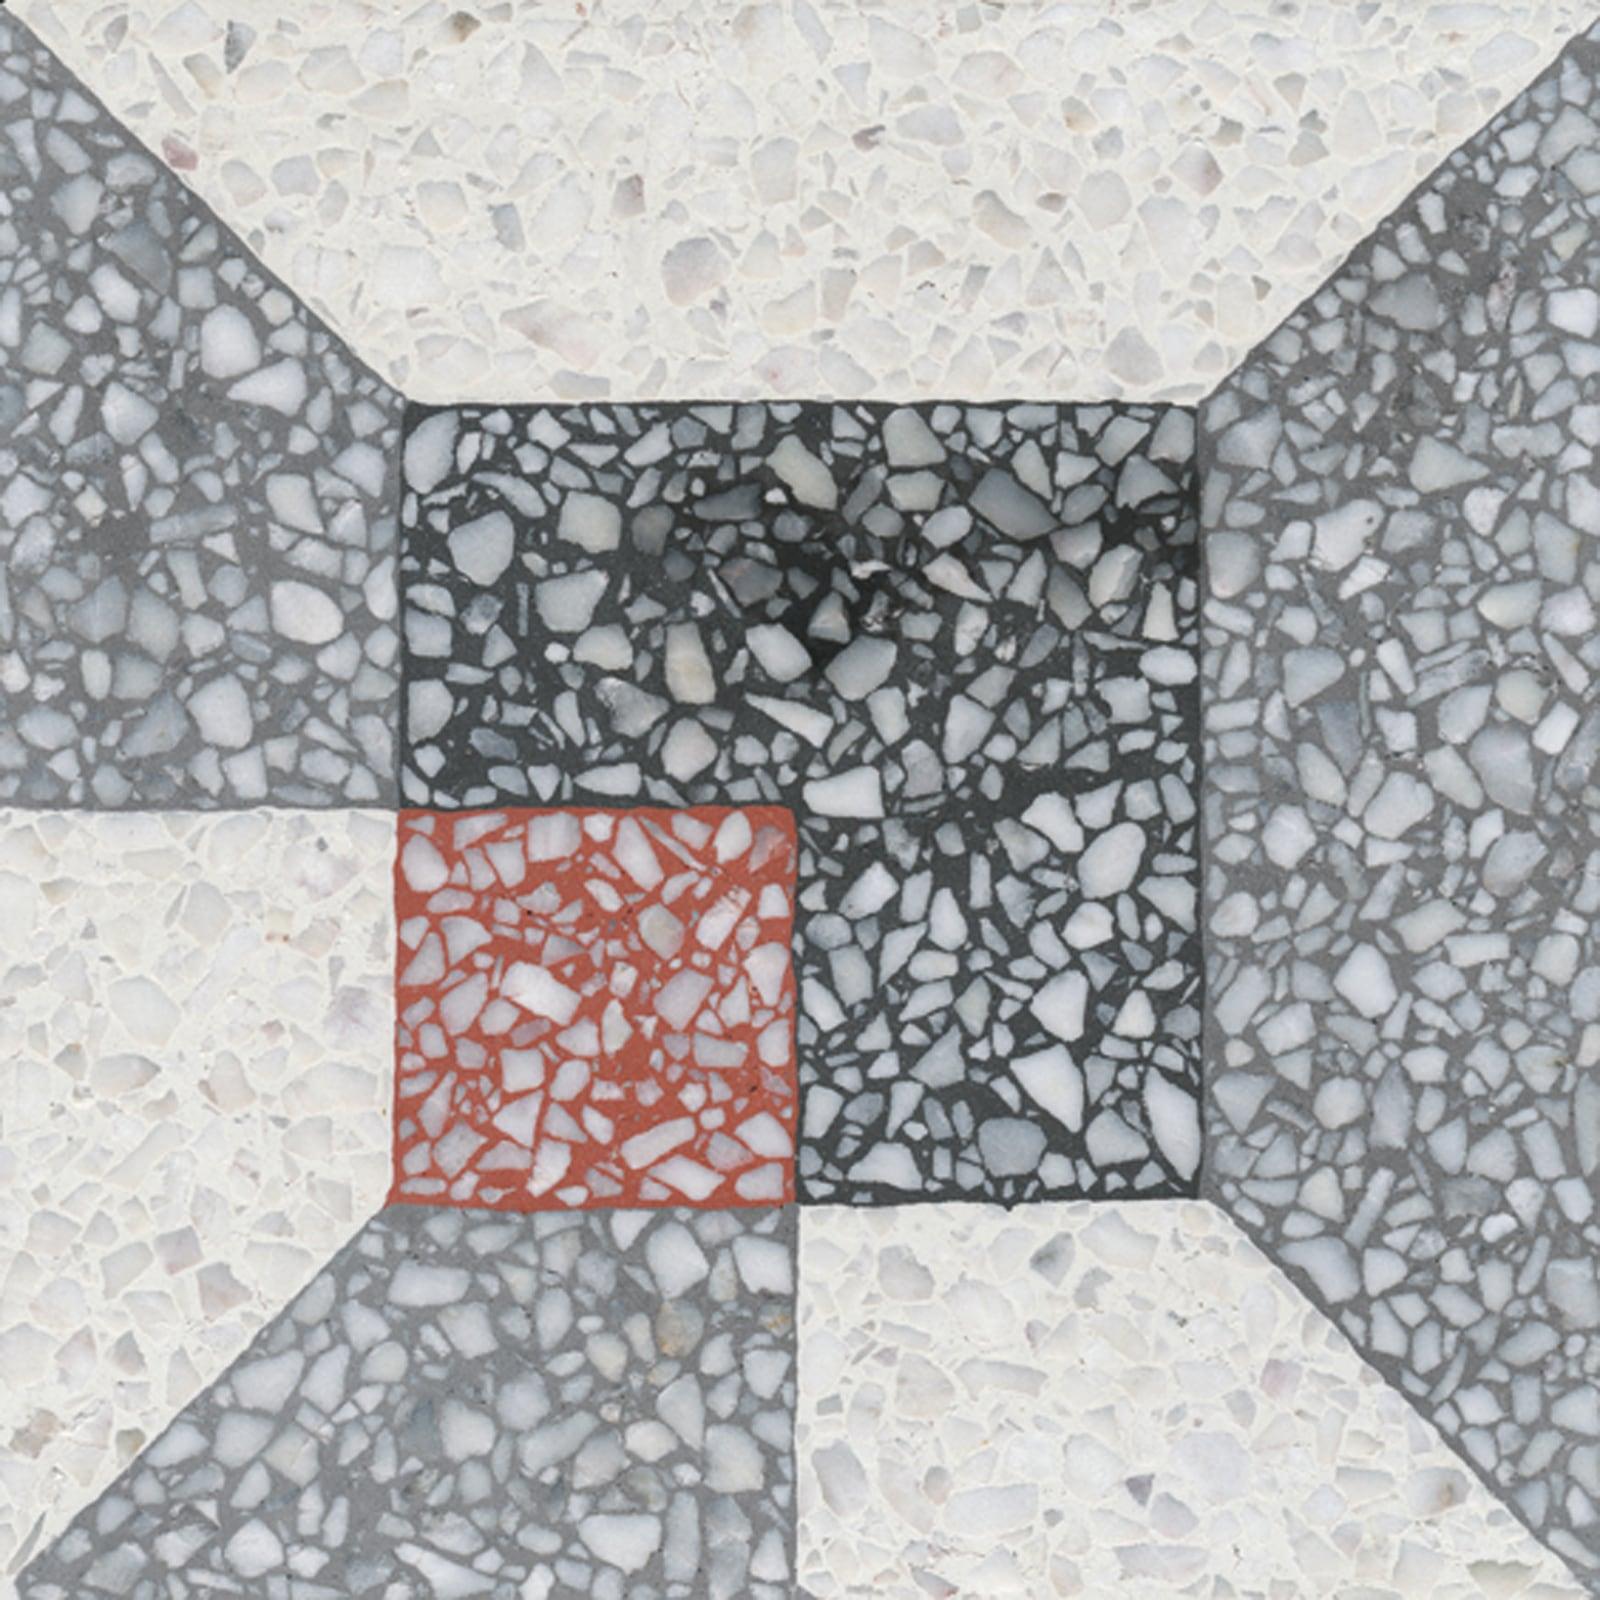 VIA Terrazzoplatte mehrfarbiges Muster aus Formen